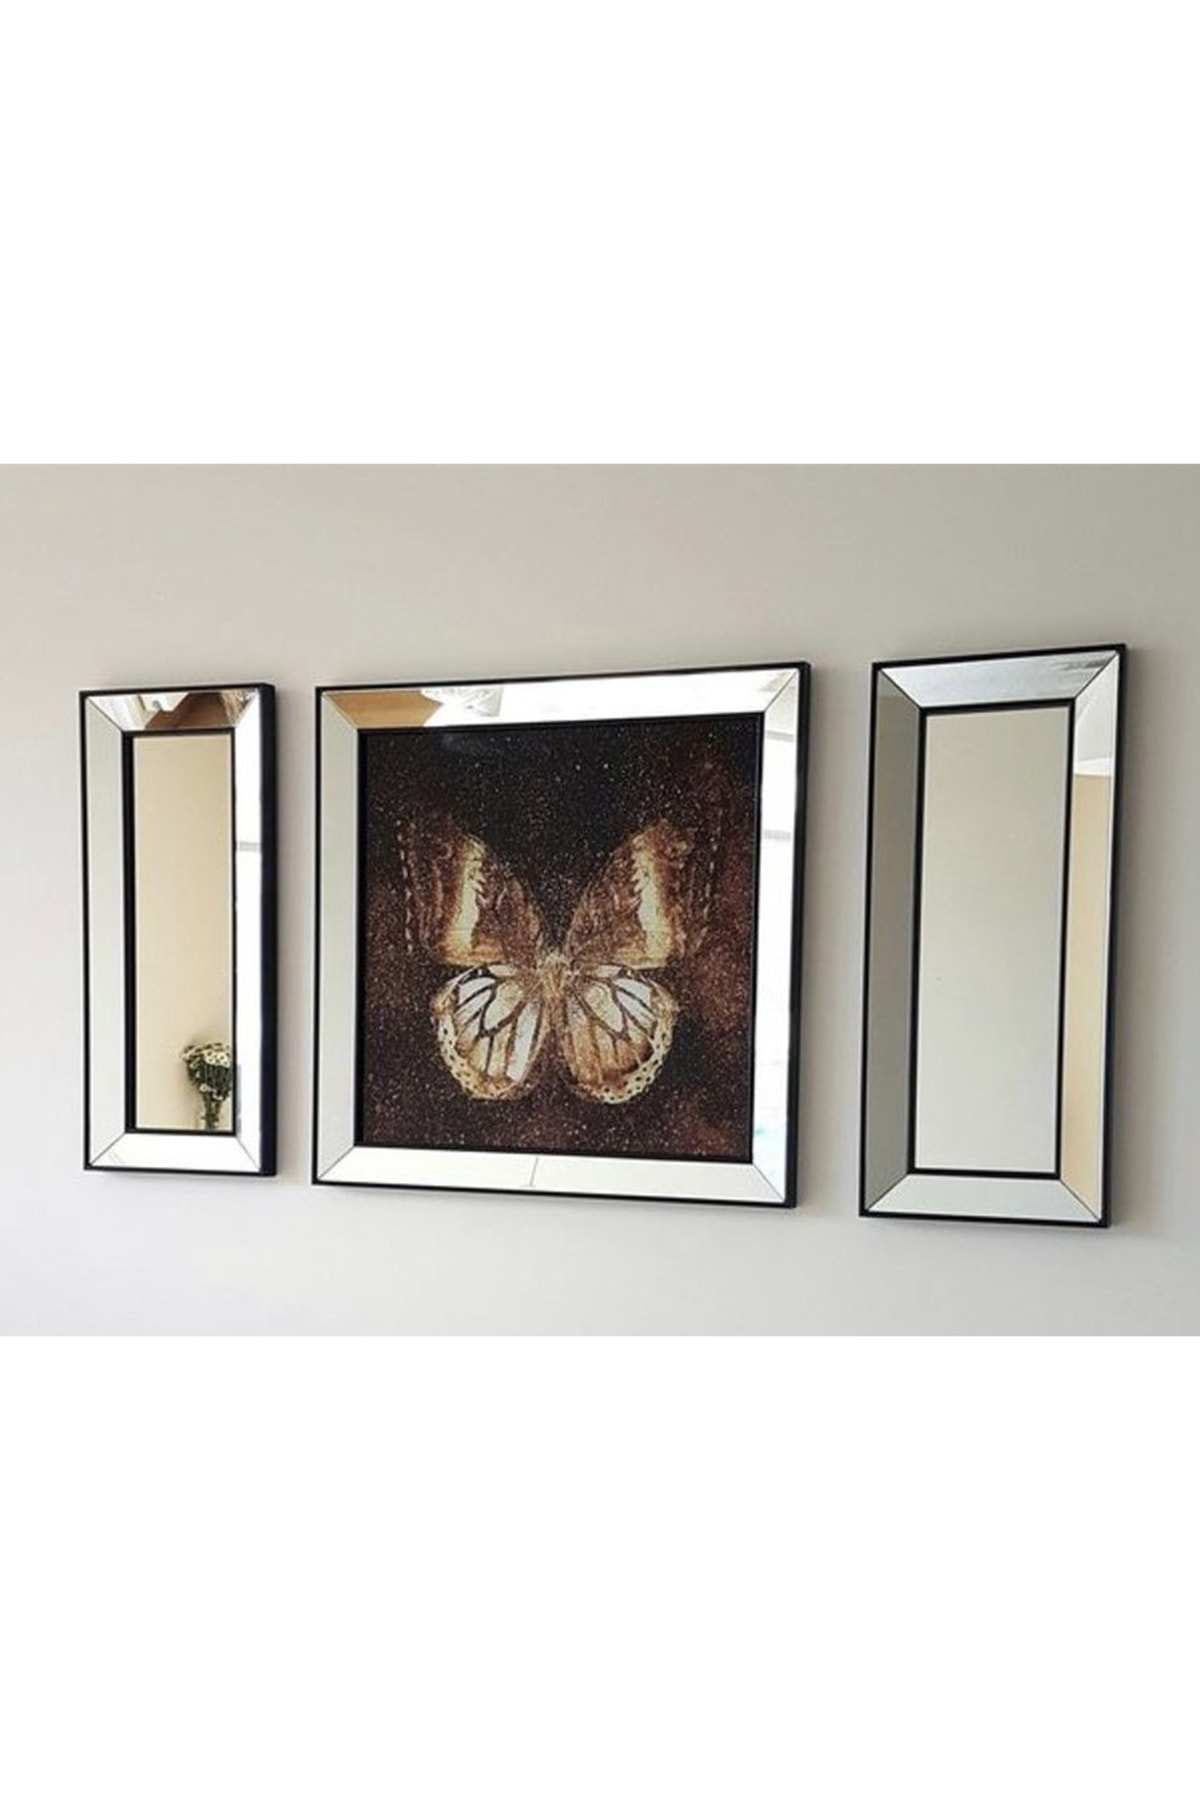 Vivense Neostill Ayna Çerçeveli Tablo Temperli Cama Uv Baskı T811 1